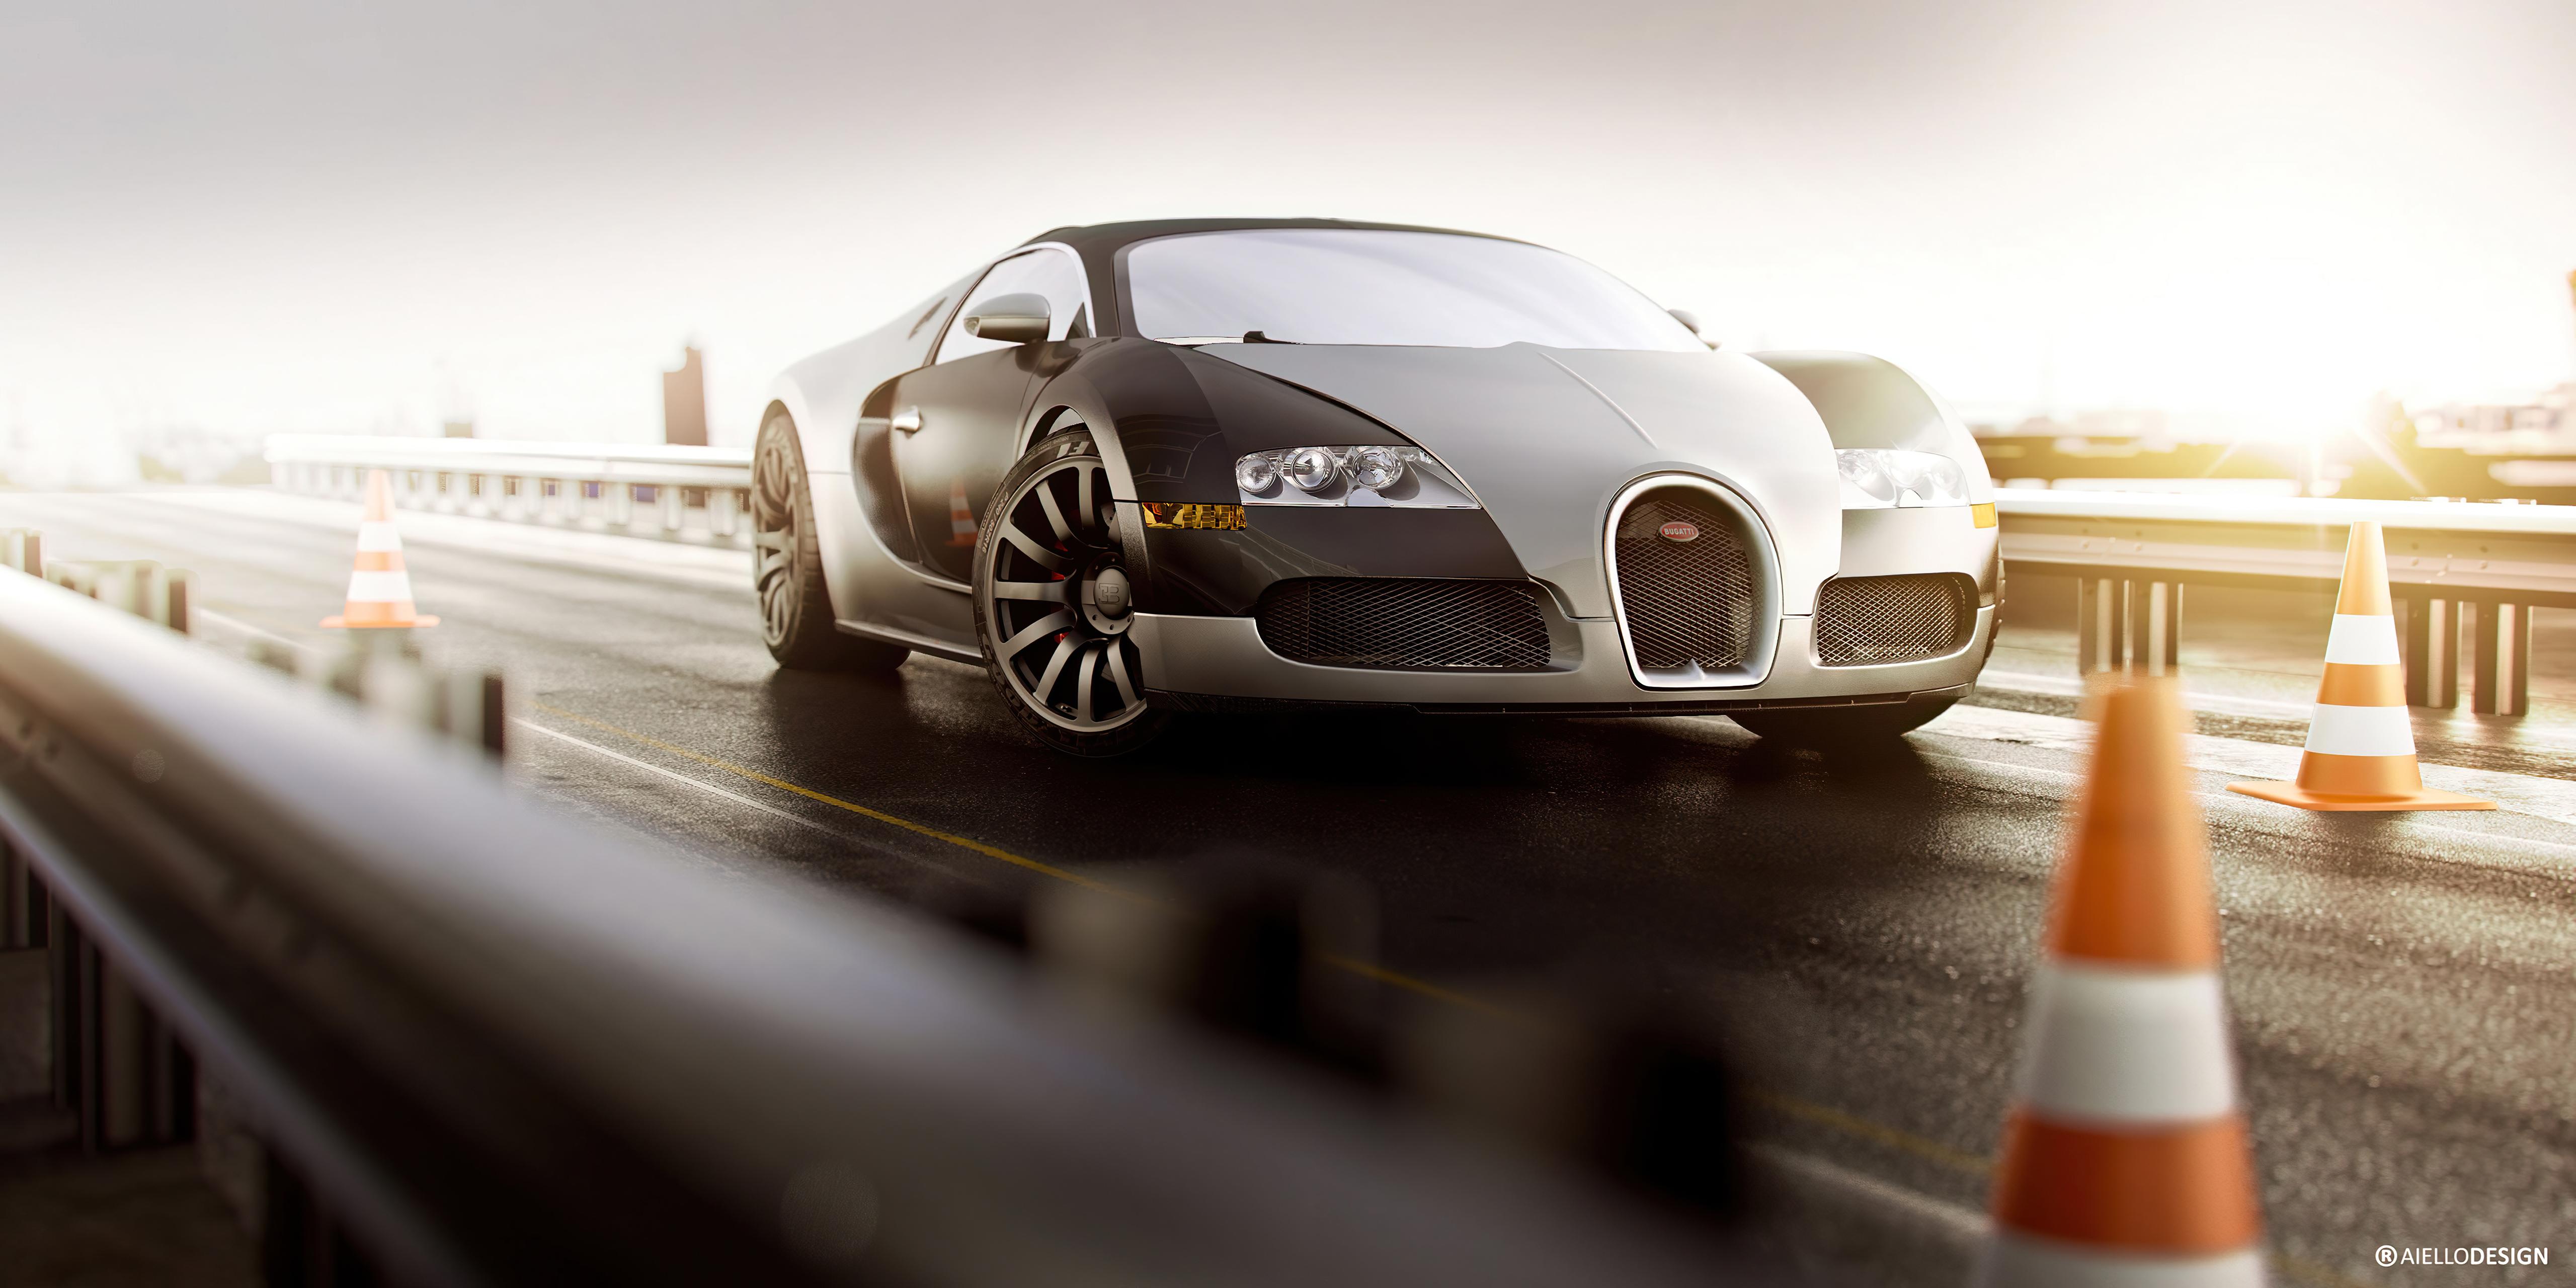 bugatti super car cgi 4k 1620171763 - Bugatti Super Car Cgi 4k - Bugatti Super Car Cgi 4k wallpapers